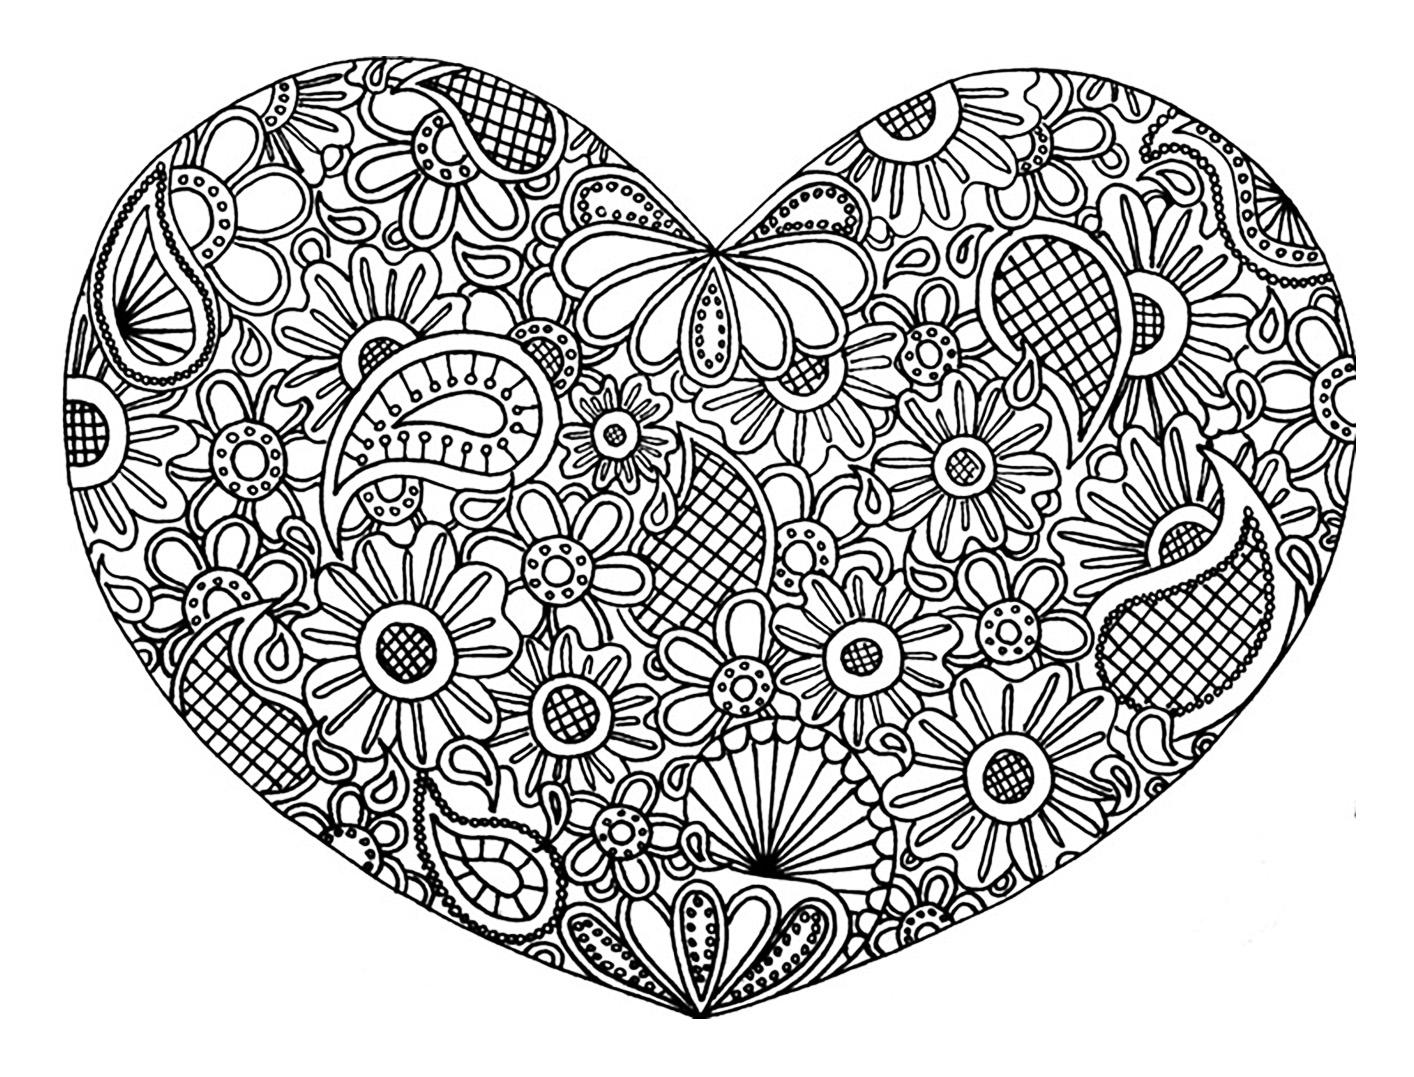 Coloriage Adulte A Imprimer Amour.Coeur Amour 3 Anti Stress Art Therapie Coloriages